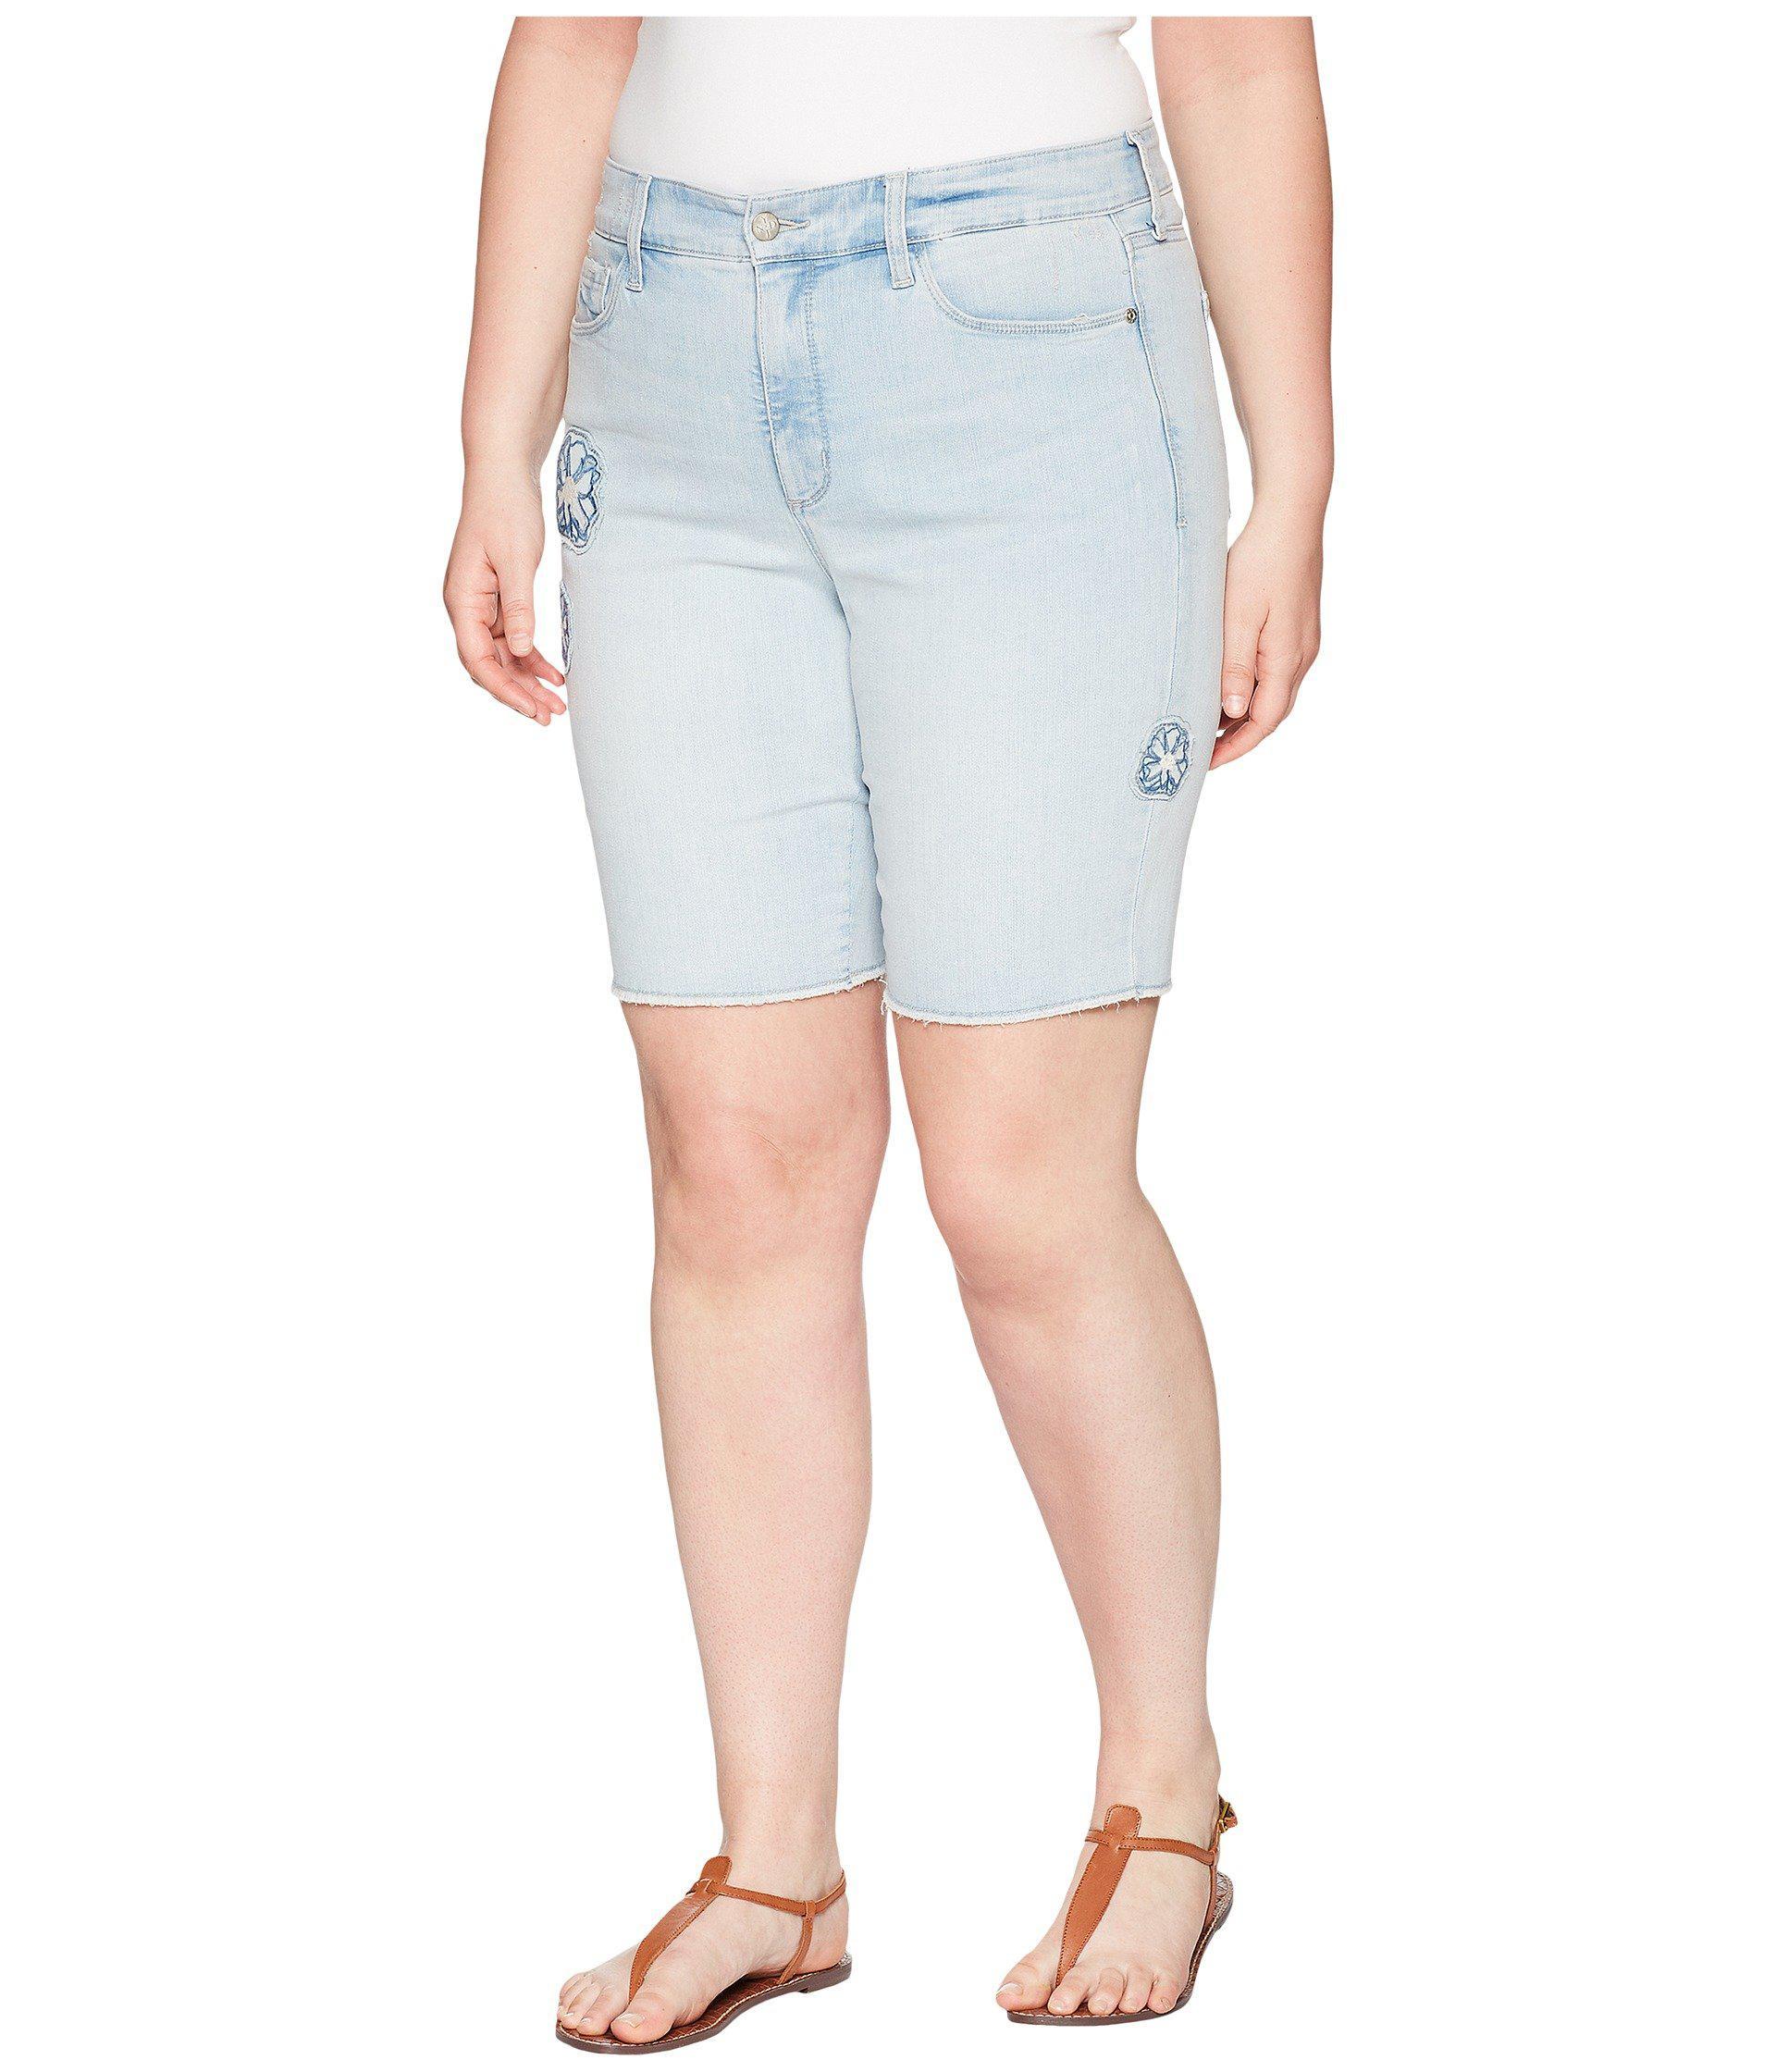 260b09a55b Lyst - NYDJ Plus Size Briella Shorts Dream Blossom In Palm Desert in Blue -  Save 18%